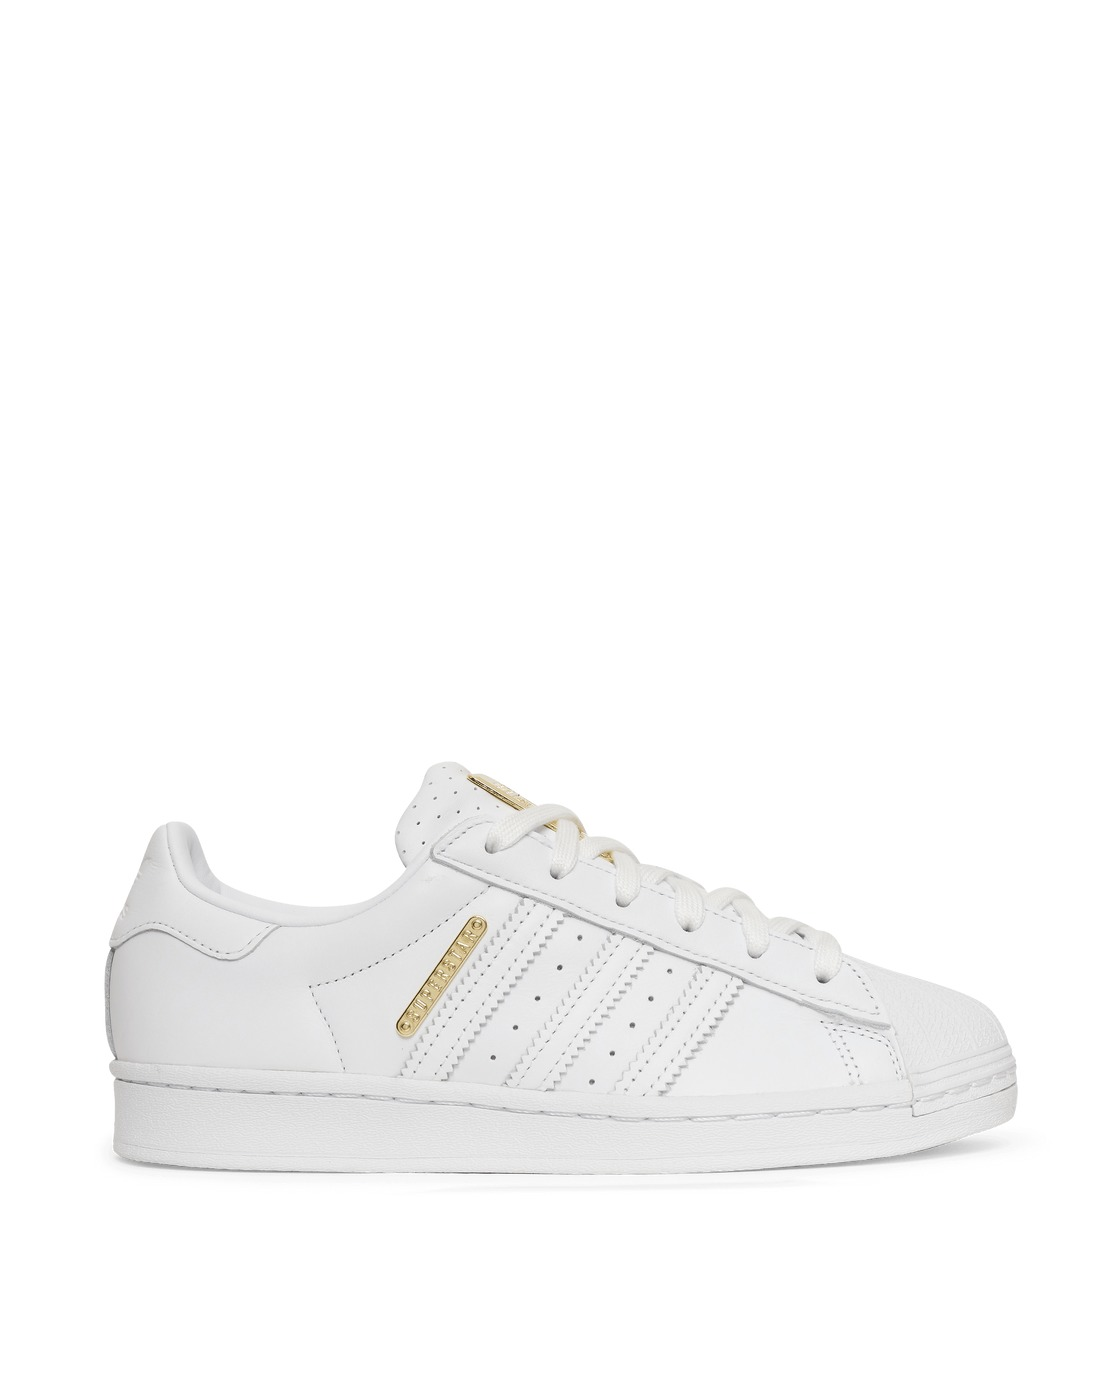 Adidas Originals Superstar Sneakers Ftw White 37